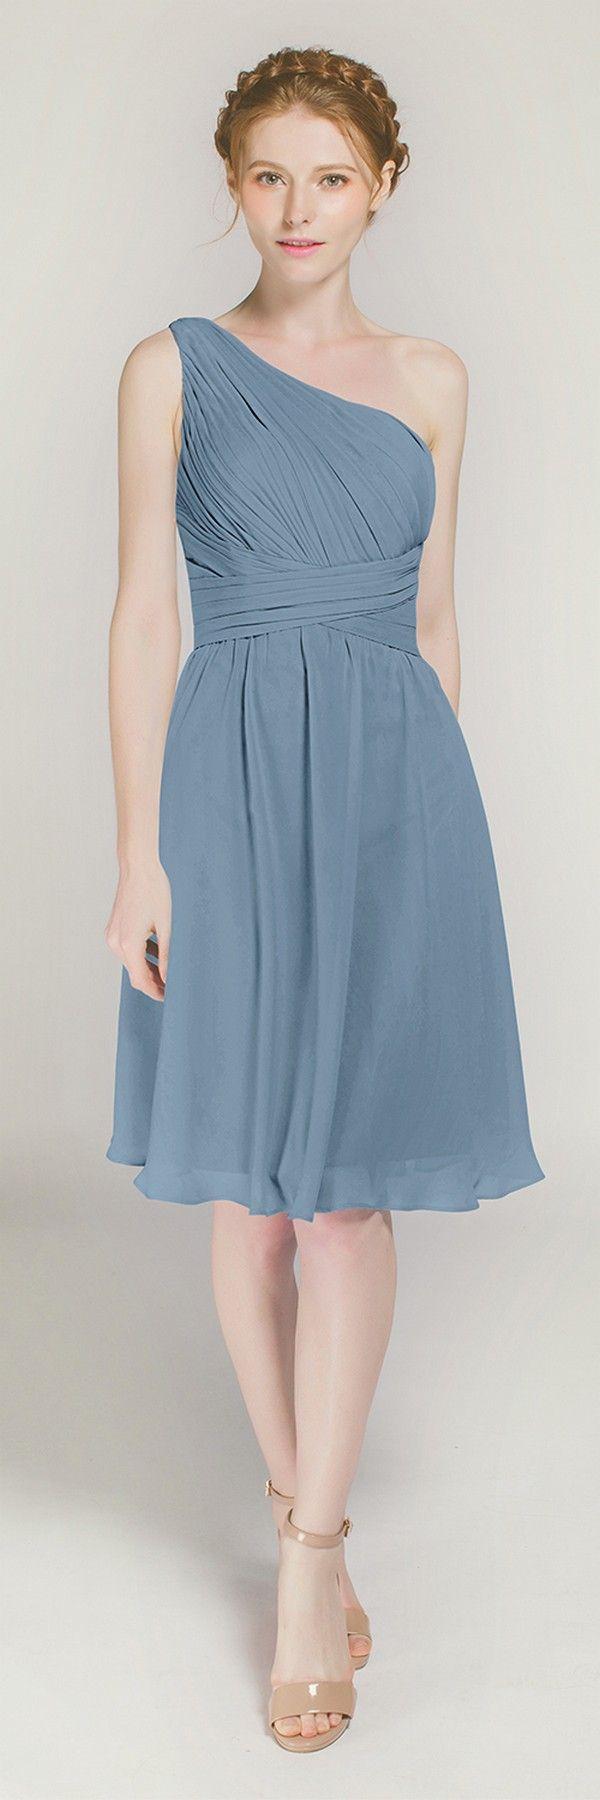 Chiffon short one shoulder bridesmaid dress tbqp dusty blue